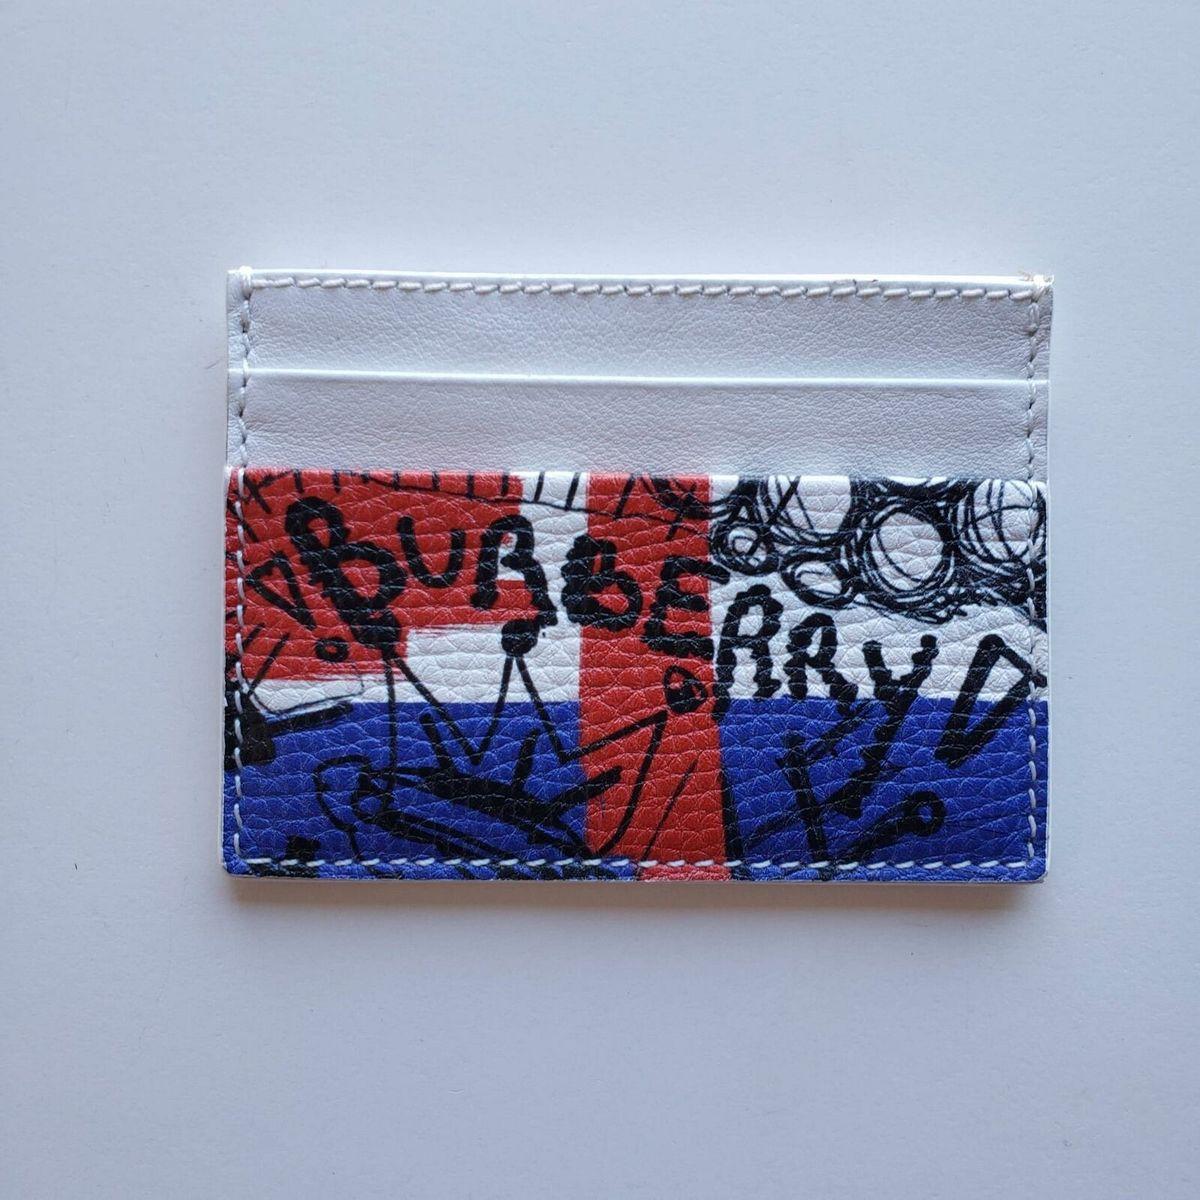 Burberry バーバリー ロゴプリント カードケース カードホルダー 財布 Logo Print Card Case Cardholder Wallet